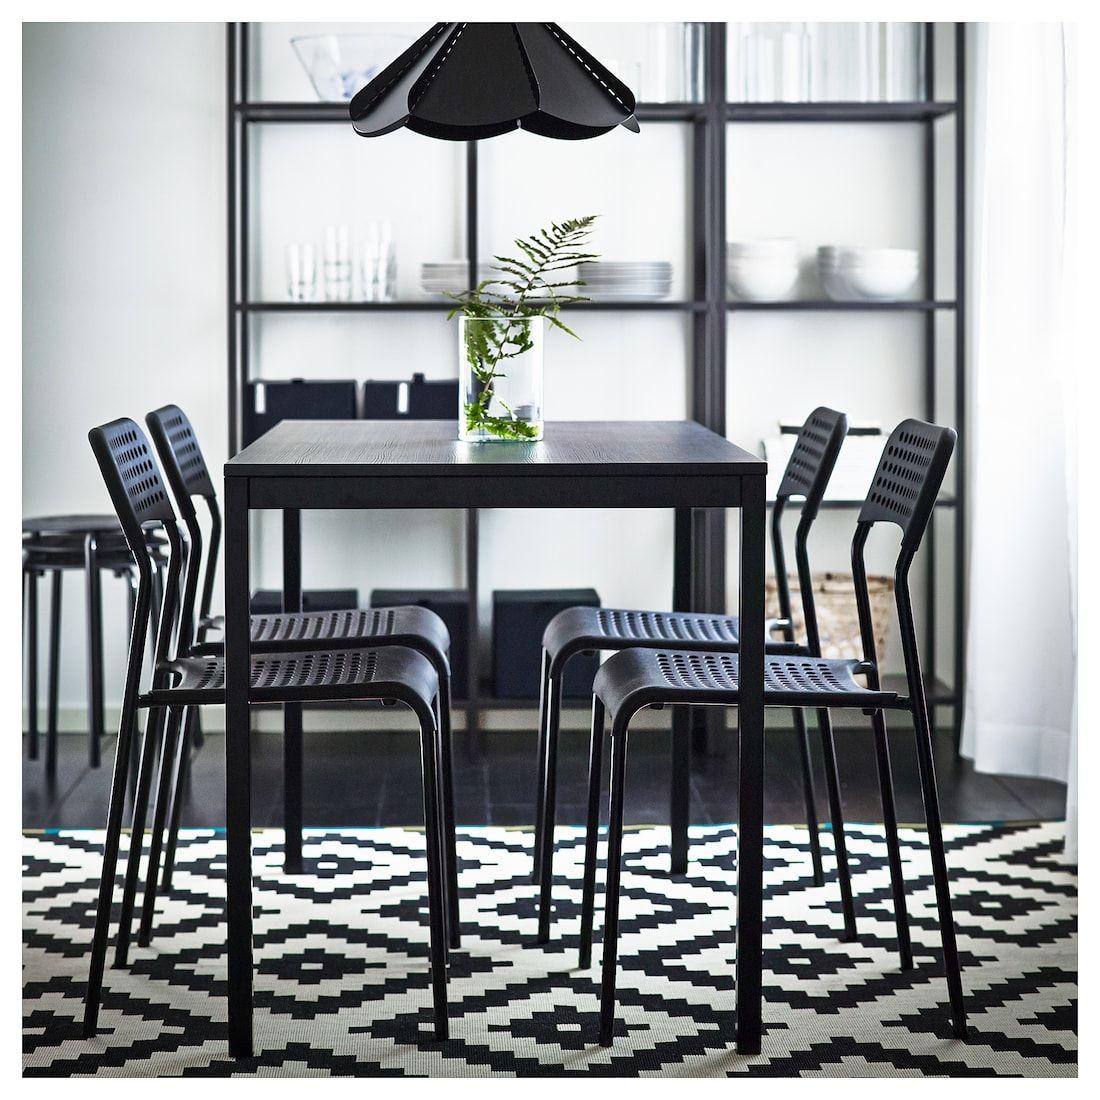 Tarendo Table Black Ikea Dining Table Black Modern Dining